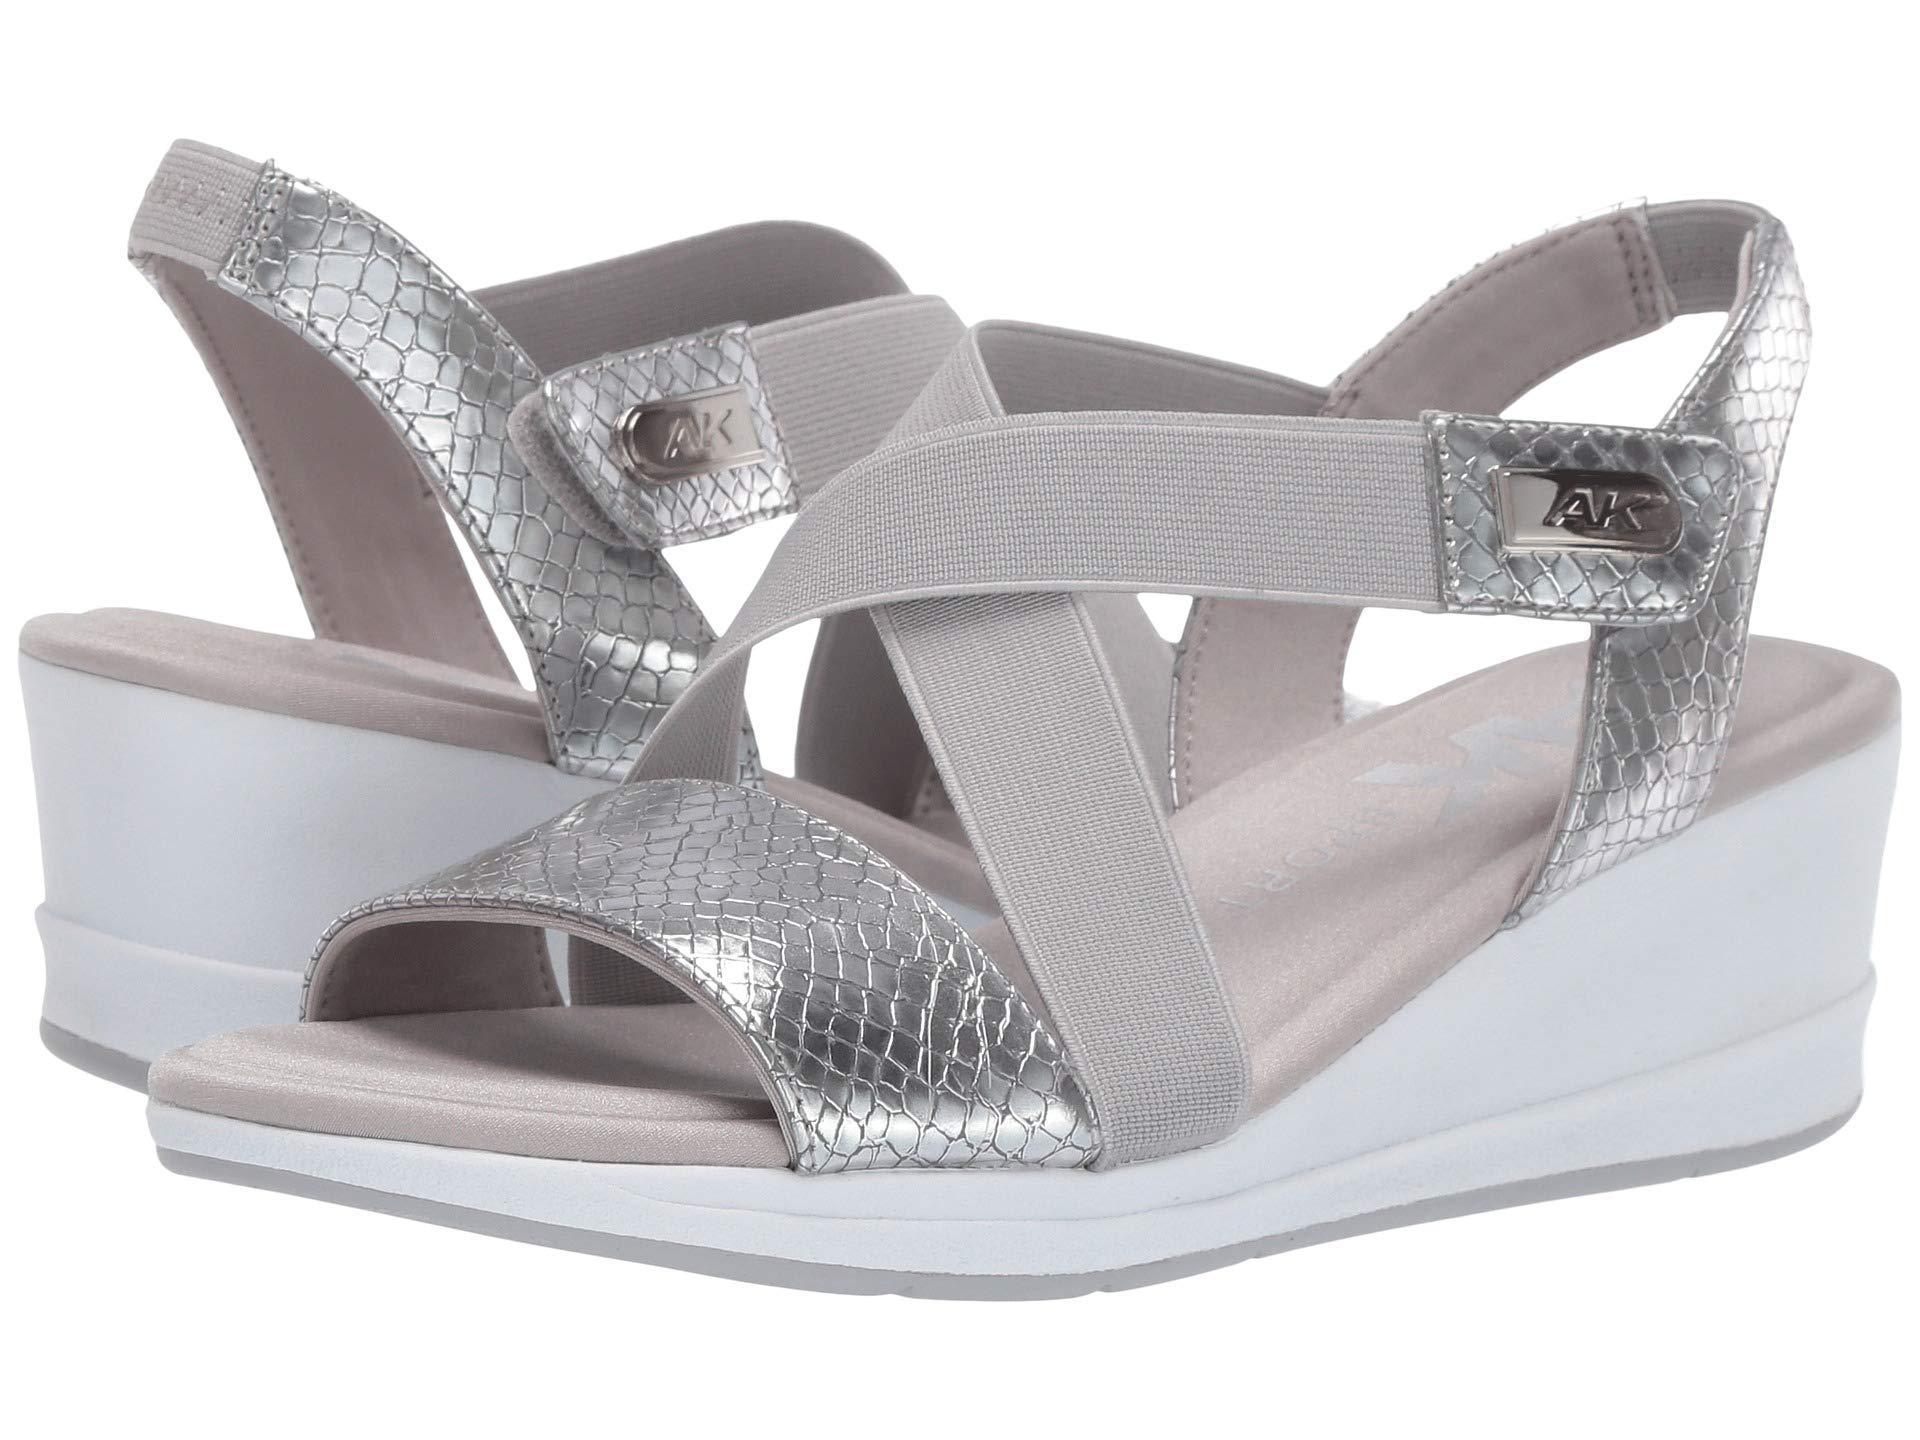 e529cd9f302 Lyst - Anne Klein Sport Nessy Wedge Sandal (silver) Women s Shoes in ...